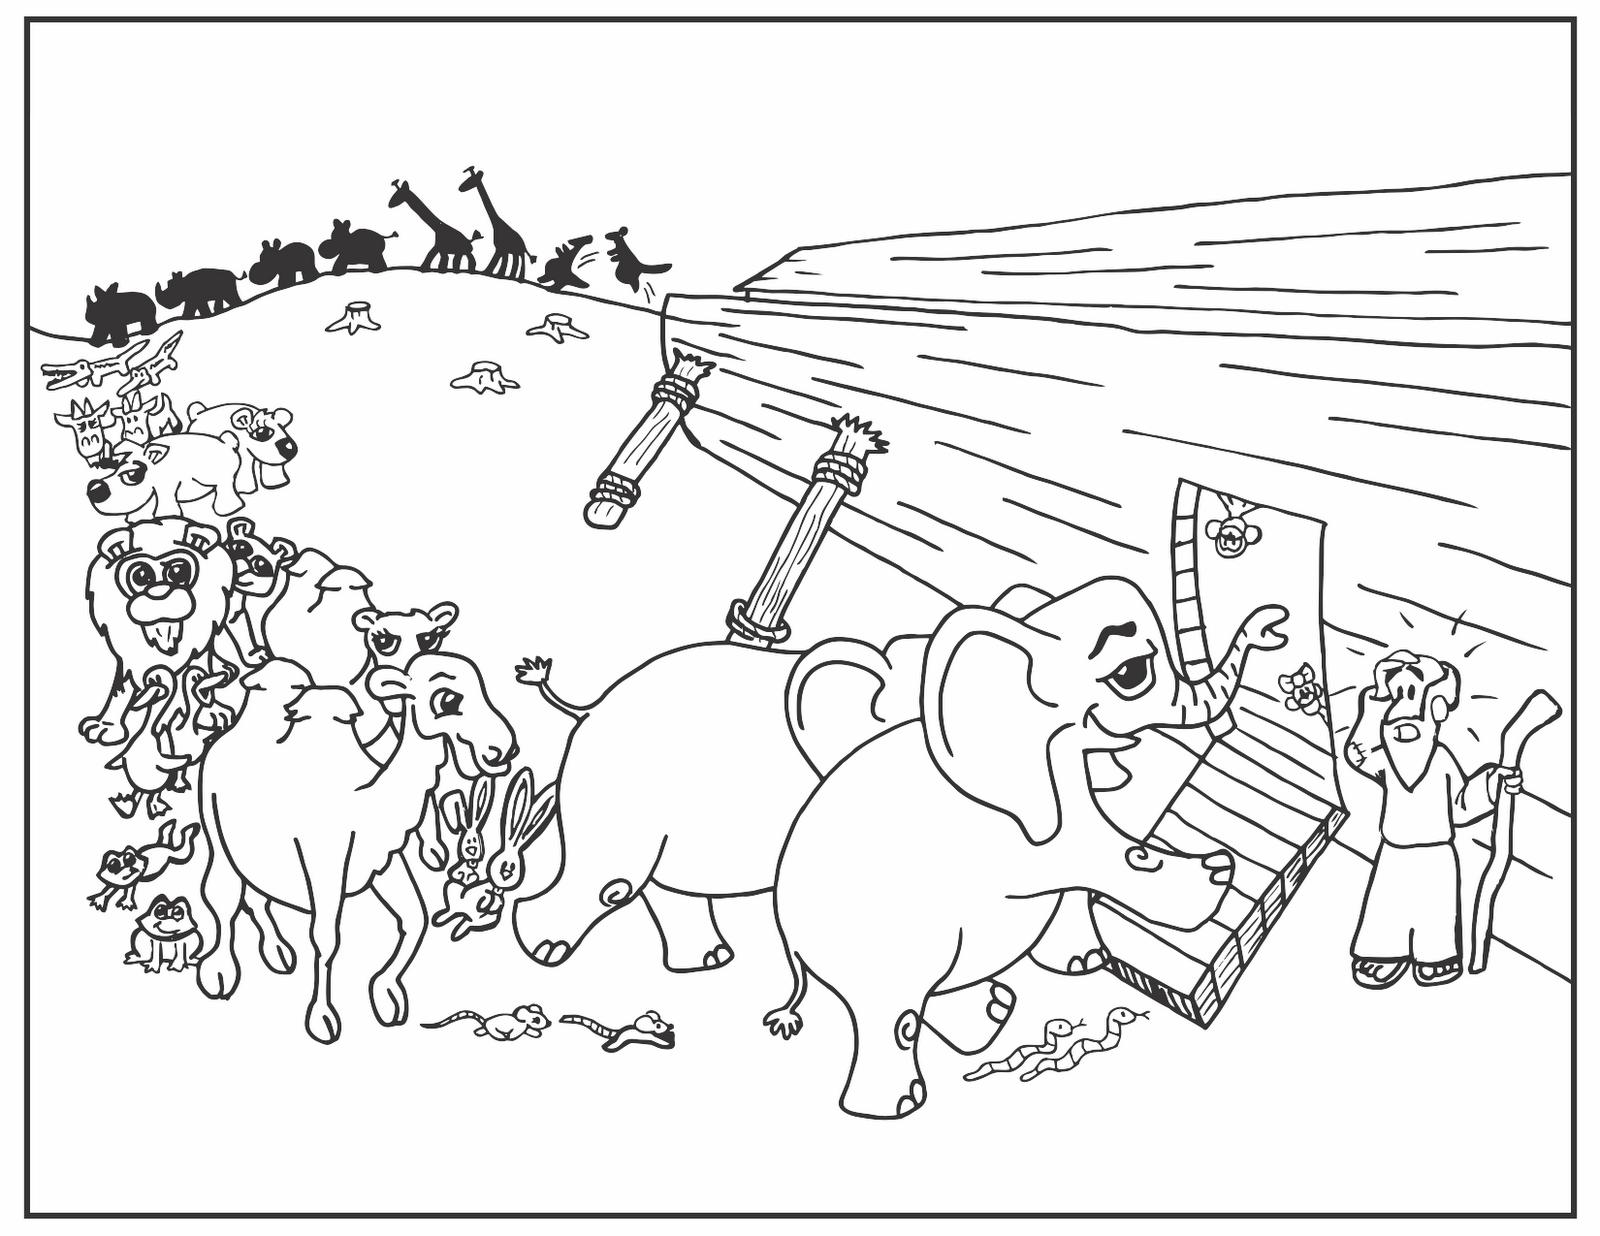 Noah ark coloring pages - coloringtop.com | Creche activities ...